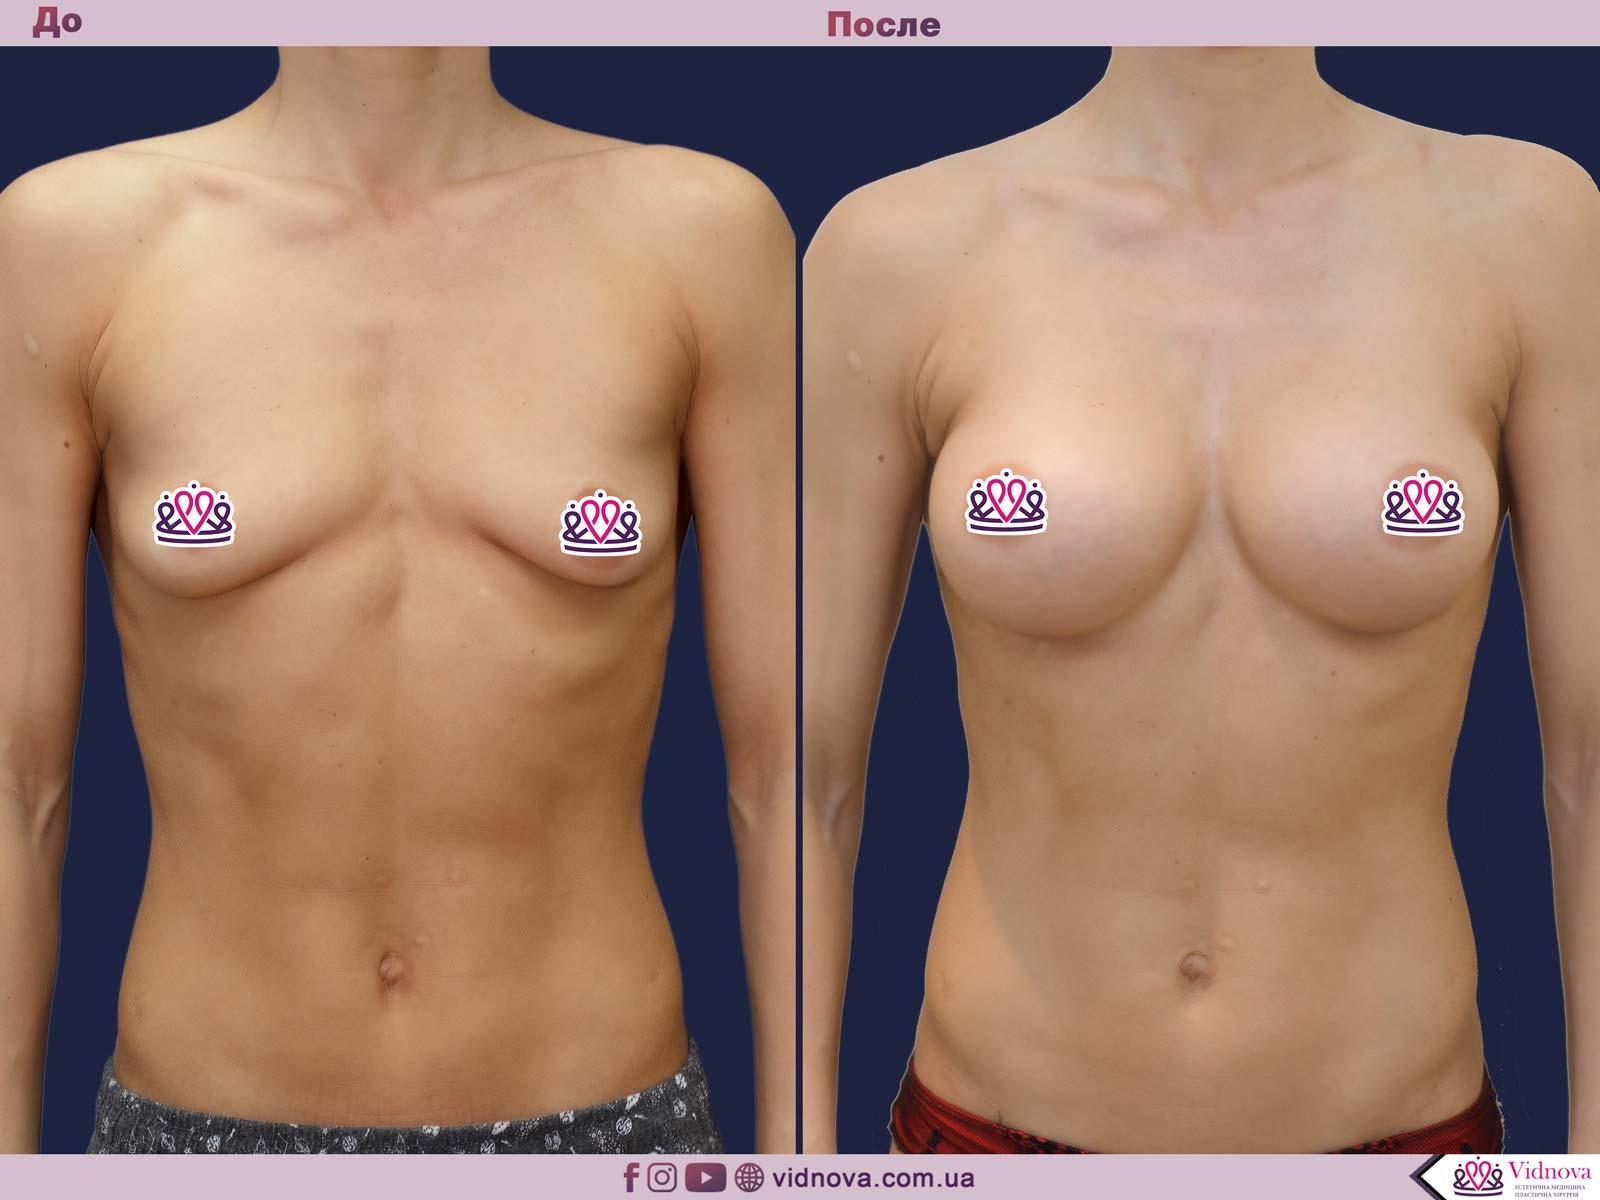 Увеличение груди: Фото ДО и ПОСЛЕ - Пример №61-1 - Клиника Vidnova